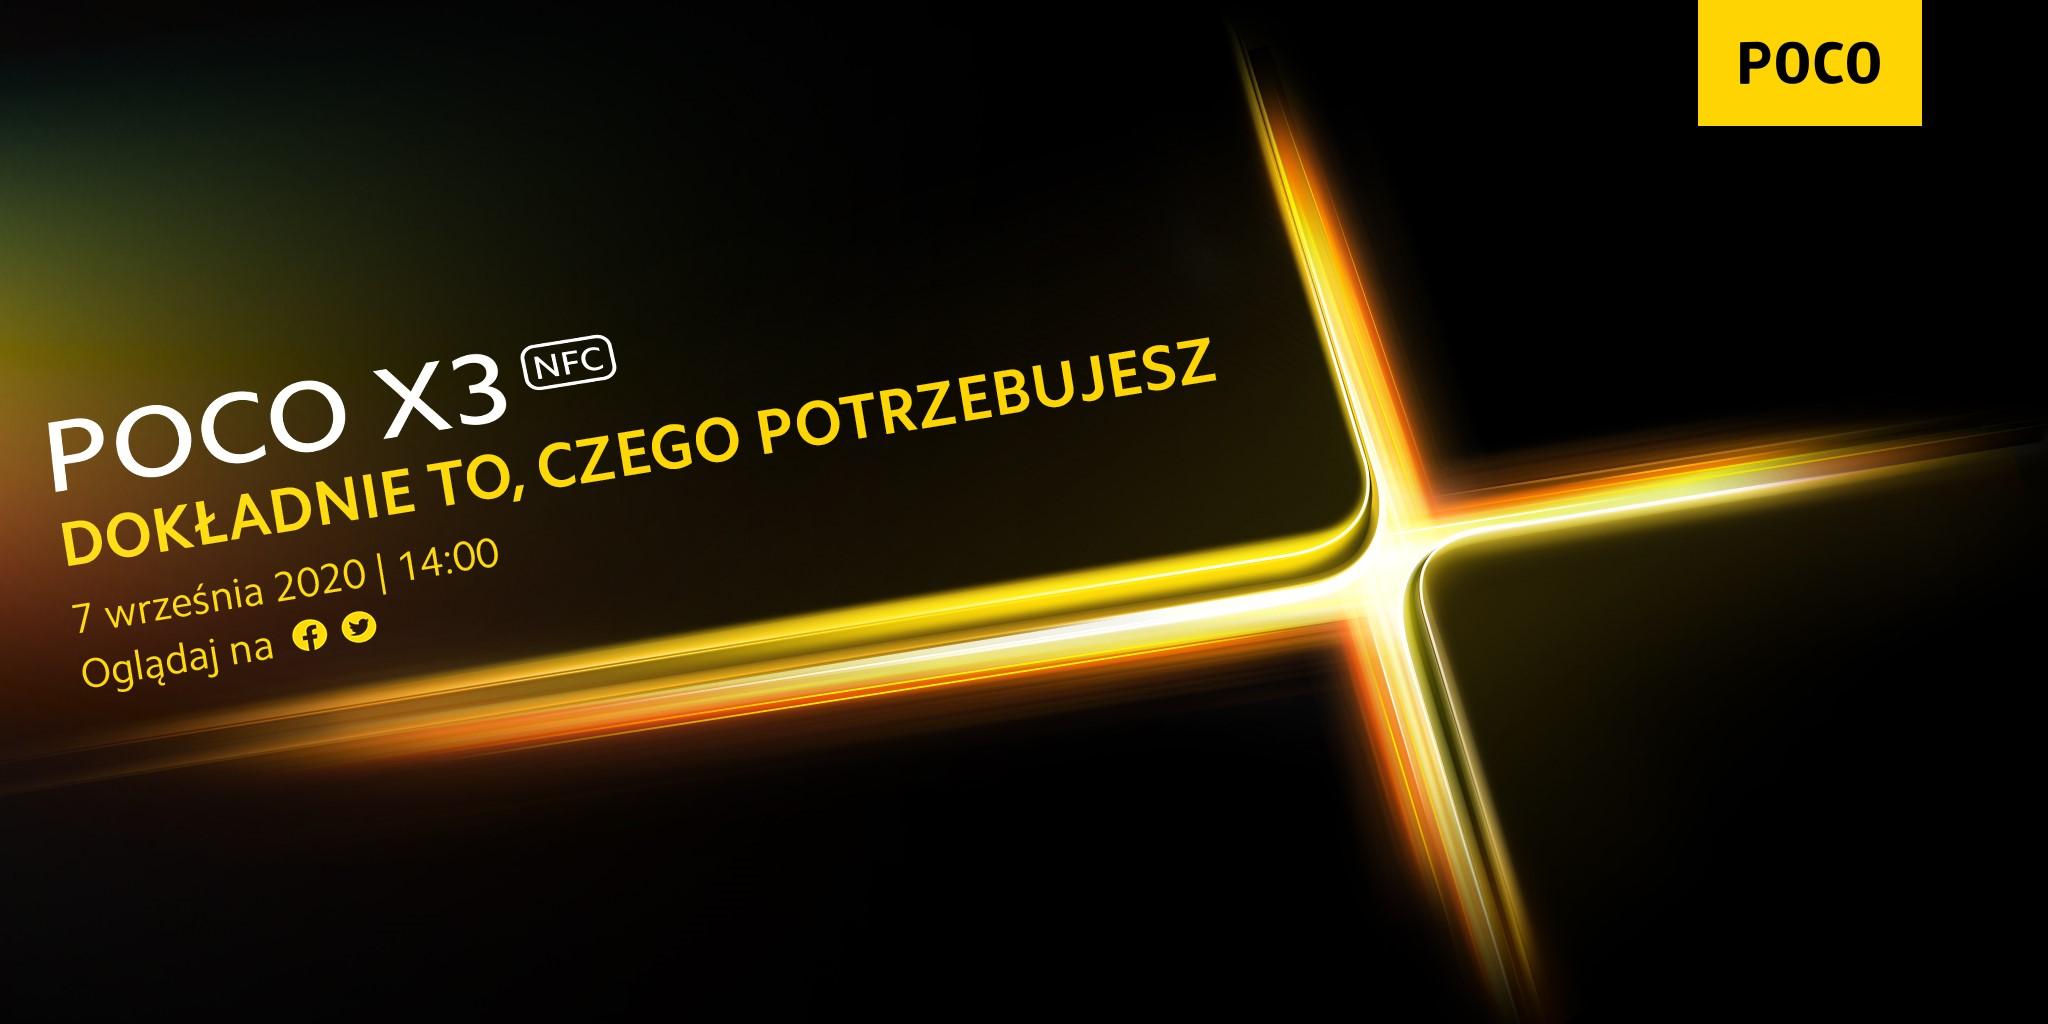 smartfon POCO X3 NFC smartphone teaser